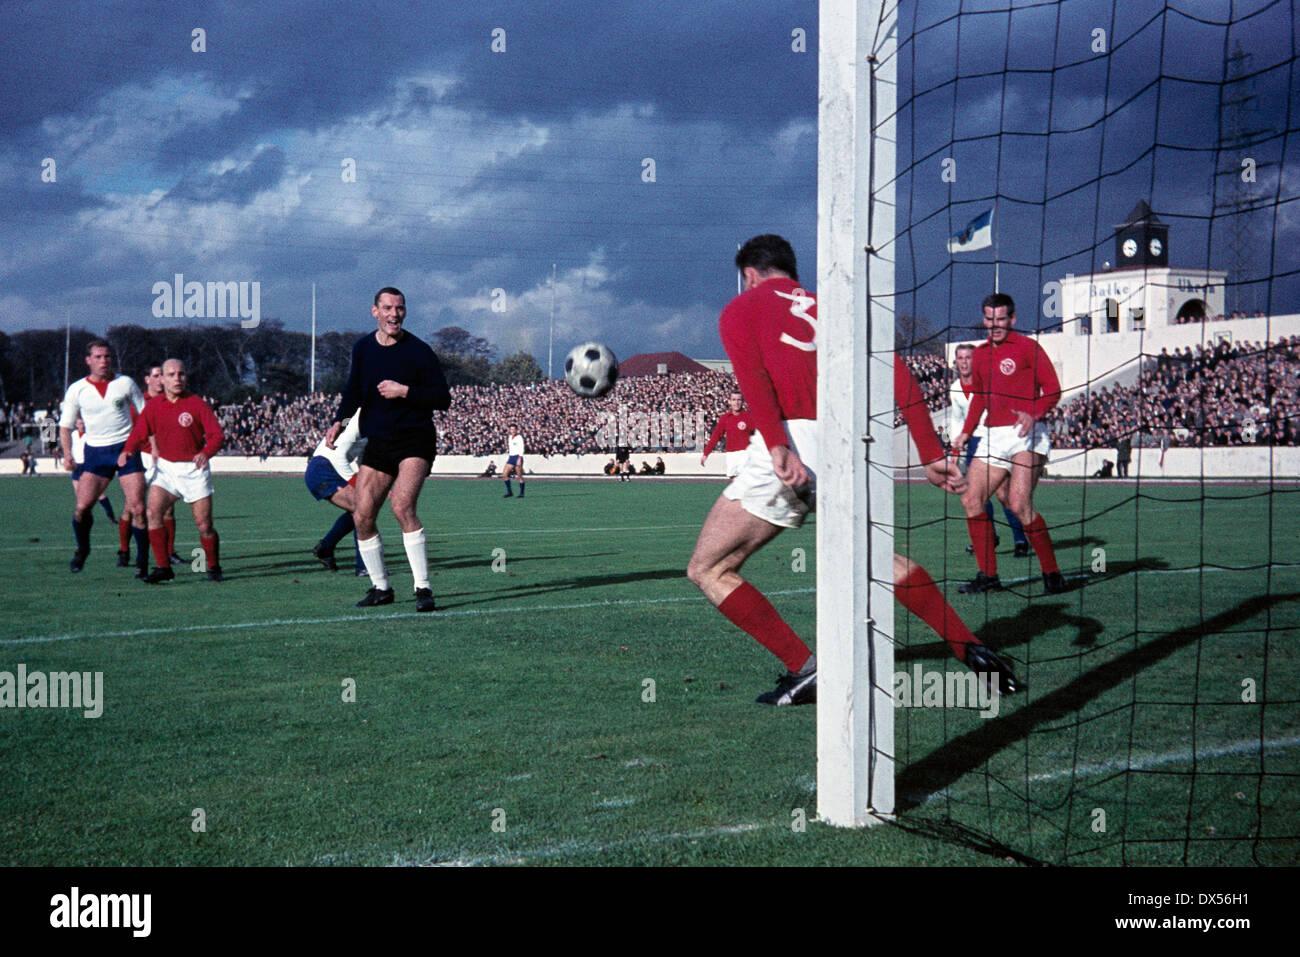 football, Regionalliga West, 1964/1965, Niederrheinstadion, Rot Weiss Oberhausen versus Fortuna Duesseldorf 1:3, defence just before the goalline, f.l.t.r. Friedhelm Kobluhn (RWO), Karl Hoffmann (Fortuna), keeper Albert Goertz (Fortuna), Werner Vigna (For - Stock Image